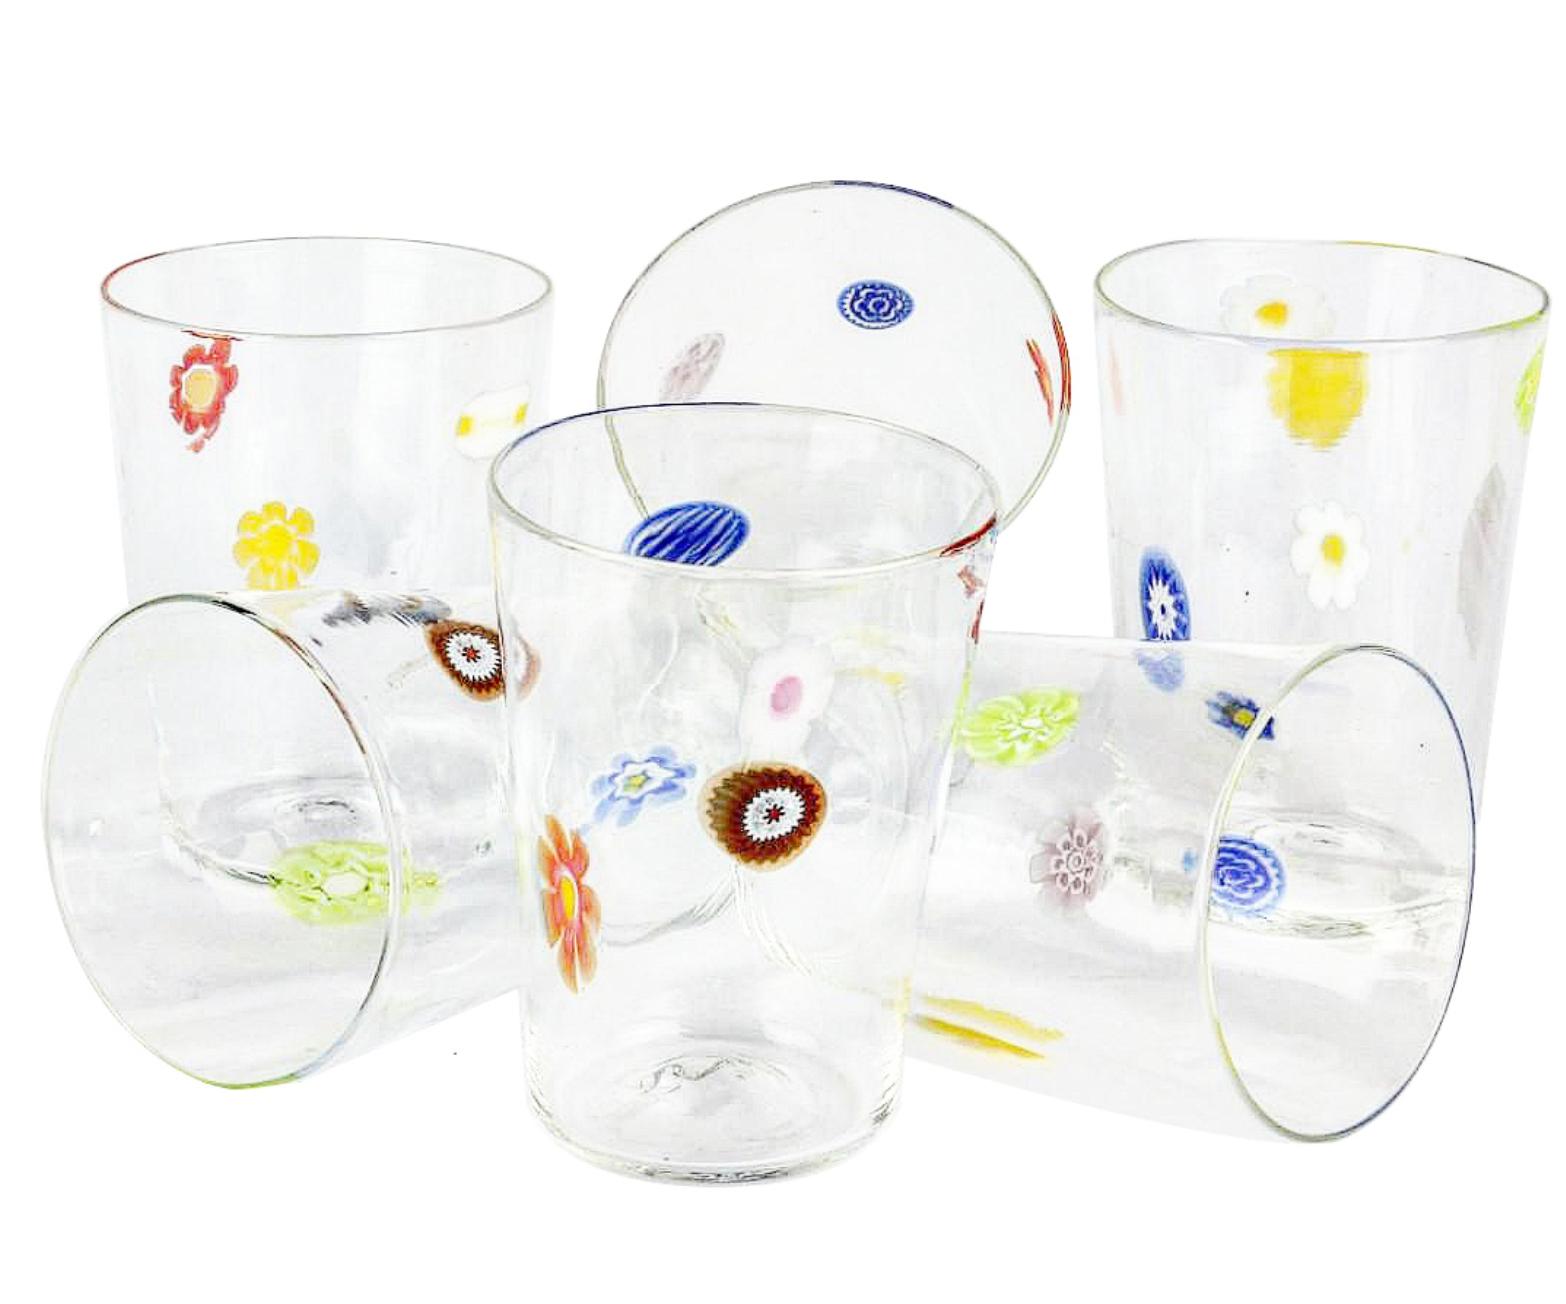 12 Modern Takes on the Delightfully Nostalgic Patterned Juice Glass